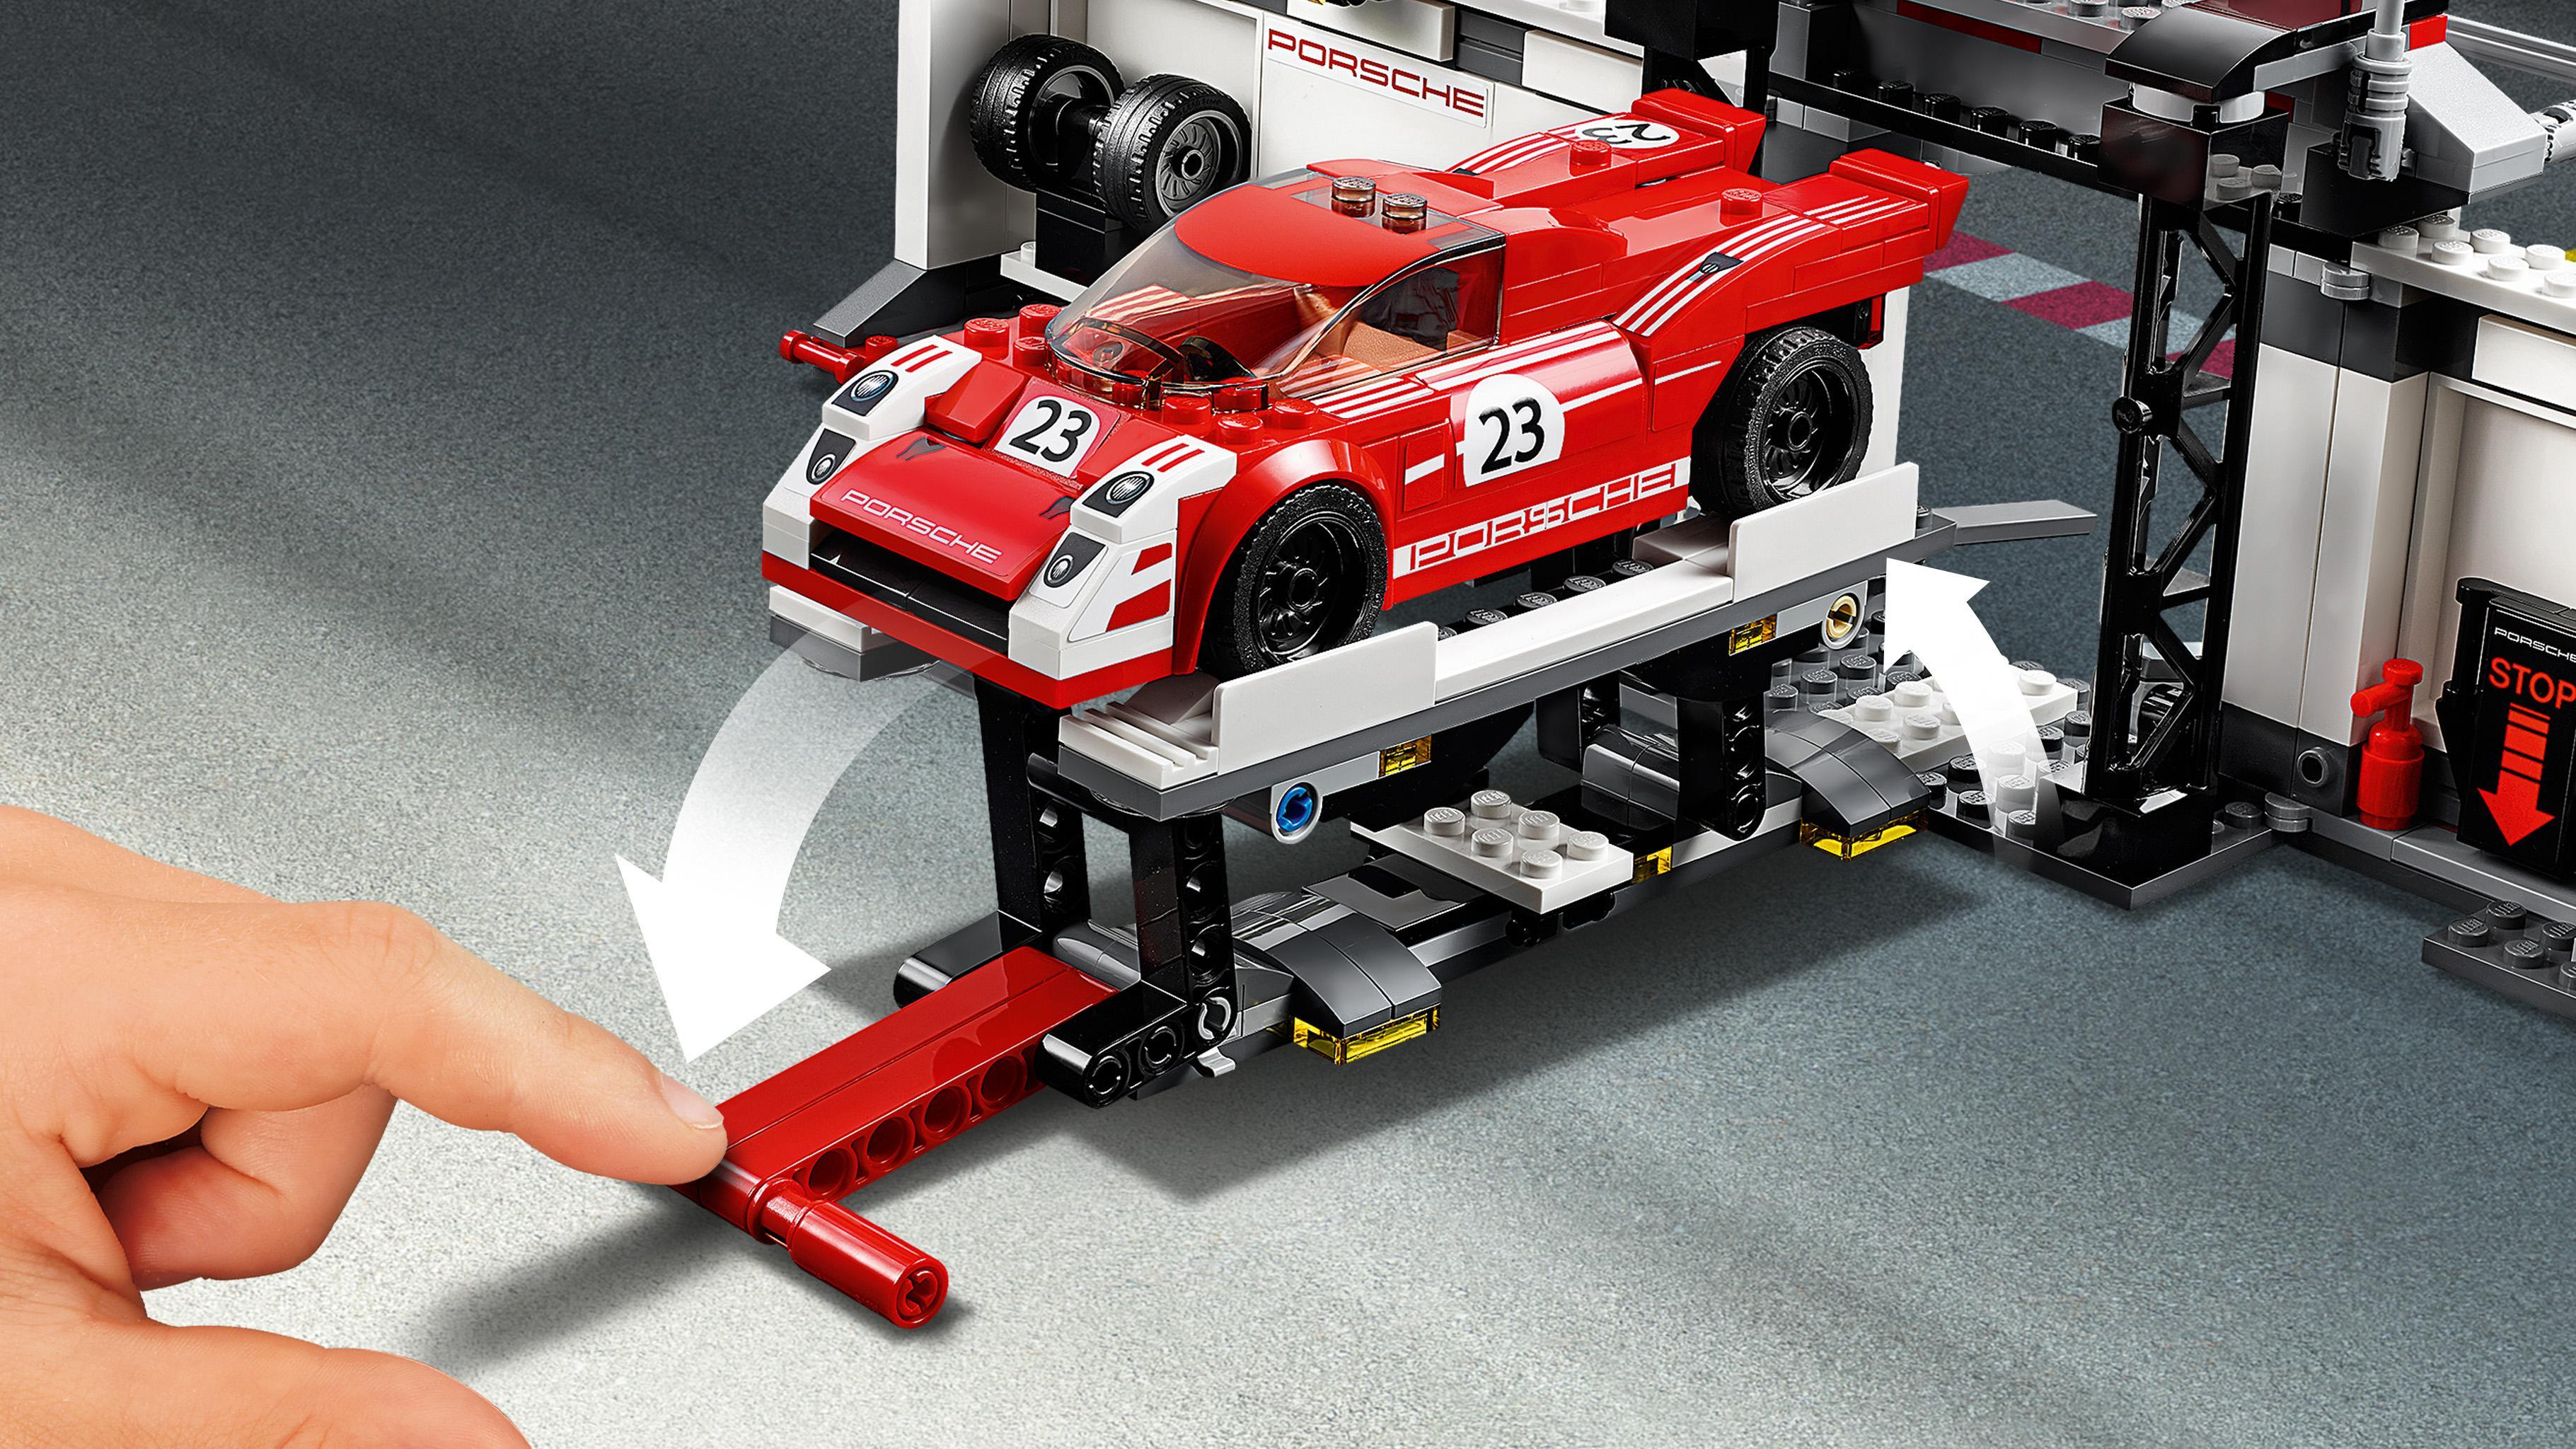 lego 75876 speed champions porsche 919 hybrid and 917k pit lane set toys games. Black Bedroom Furniture Sets. Home Design Ideas